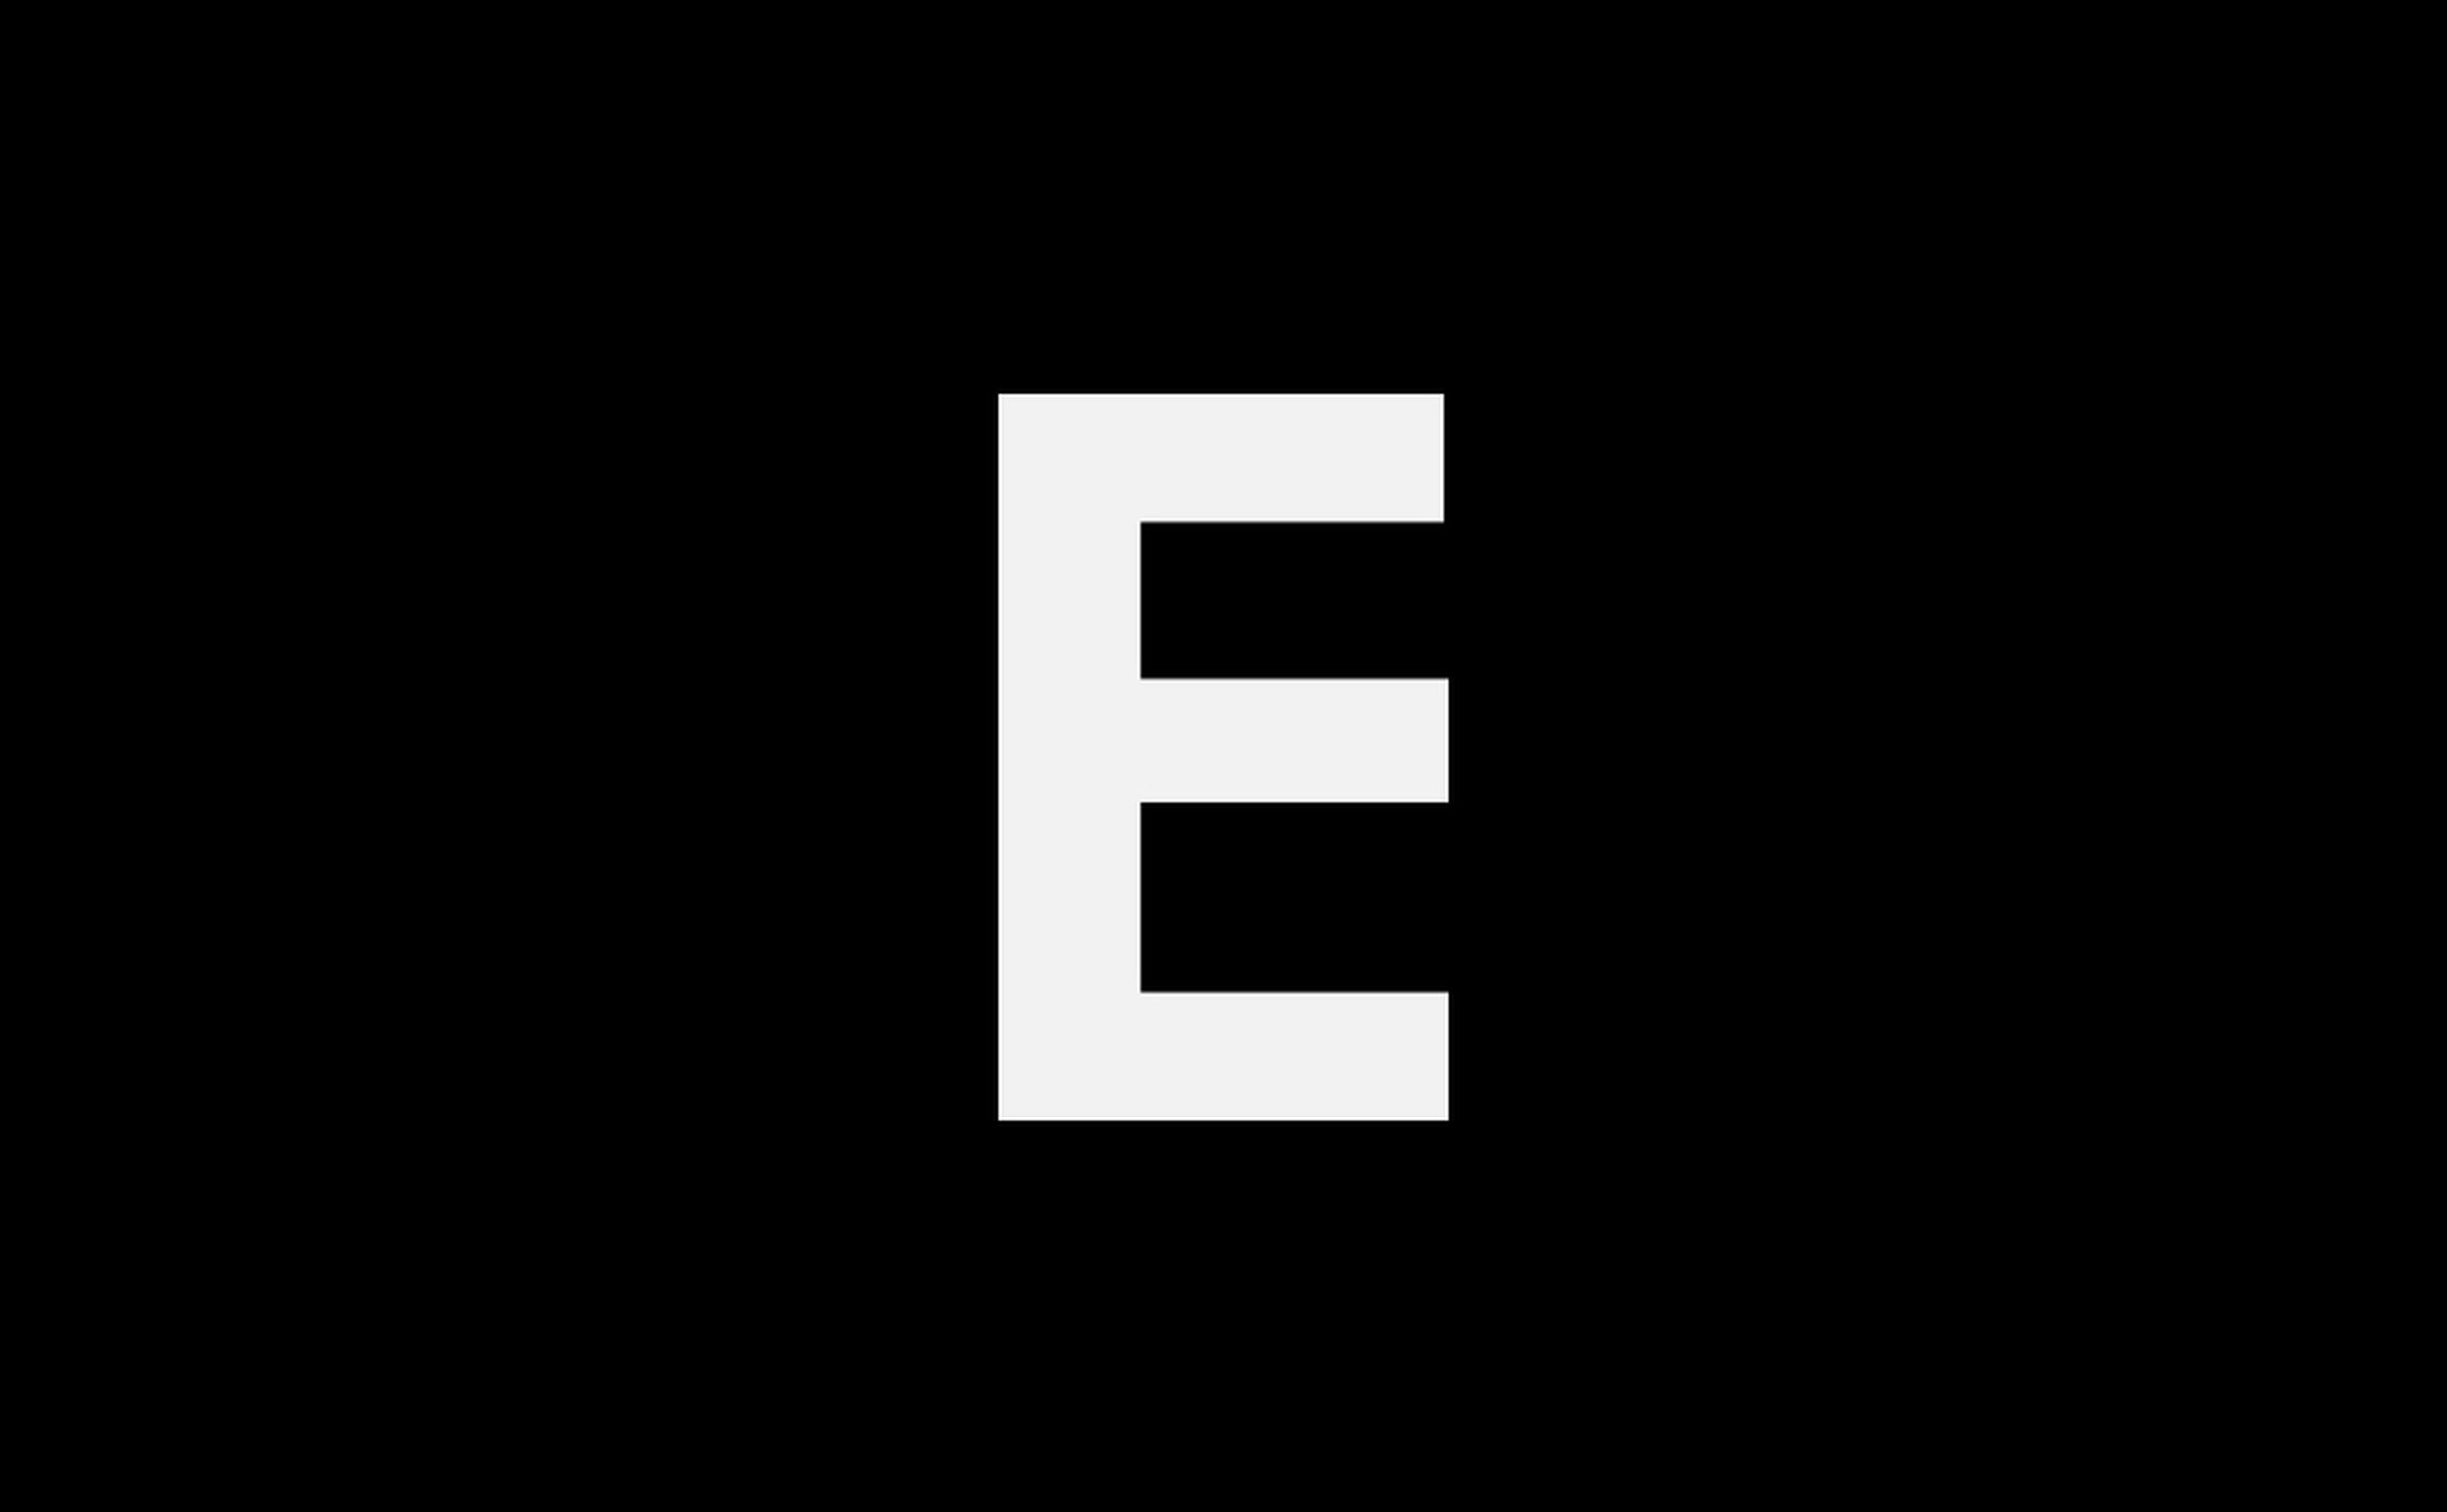 Cropped image of hand wearing wedding ring